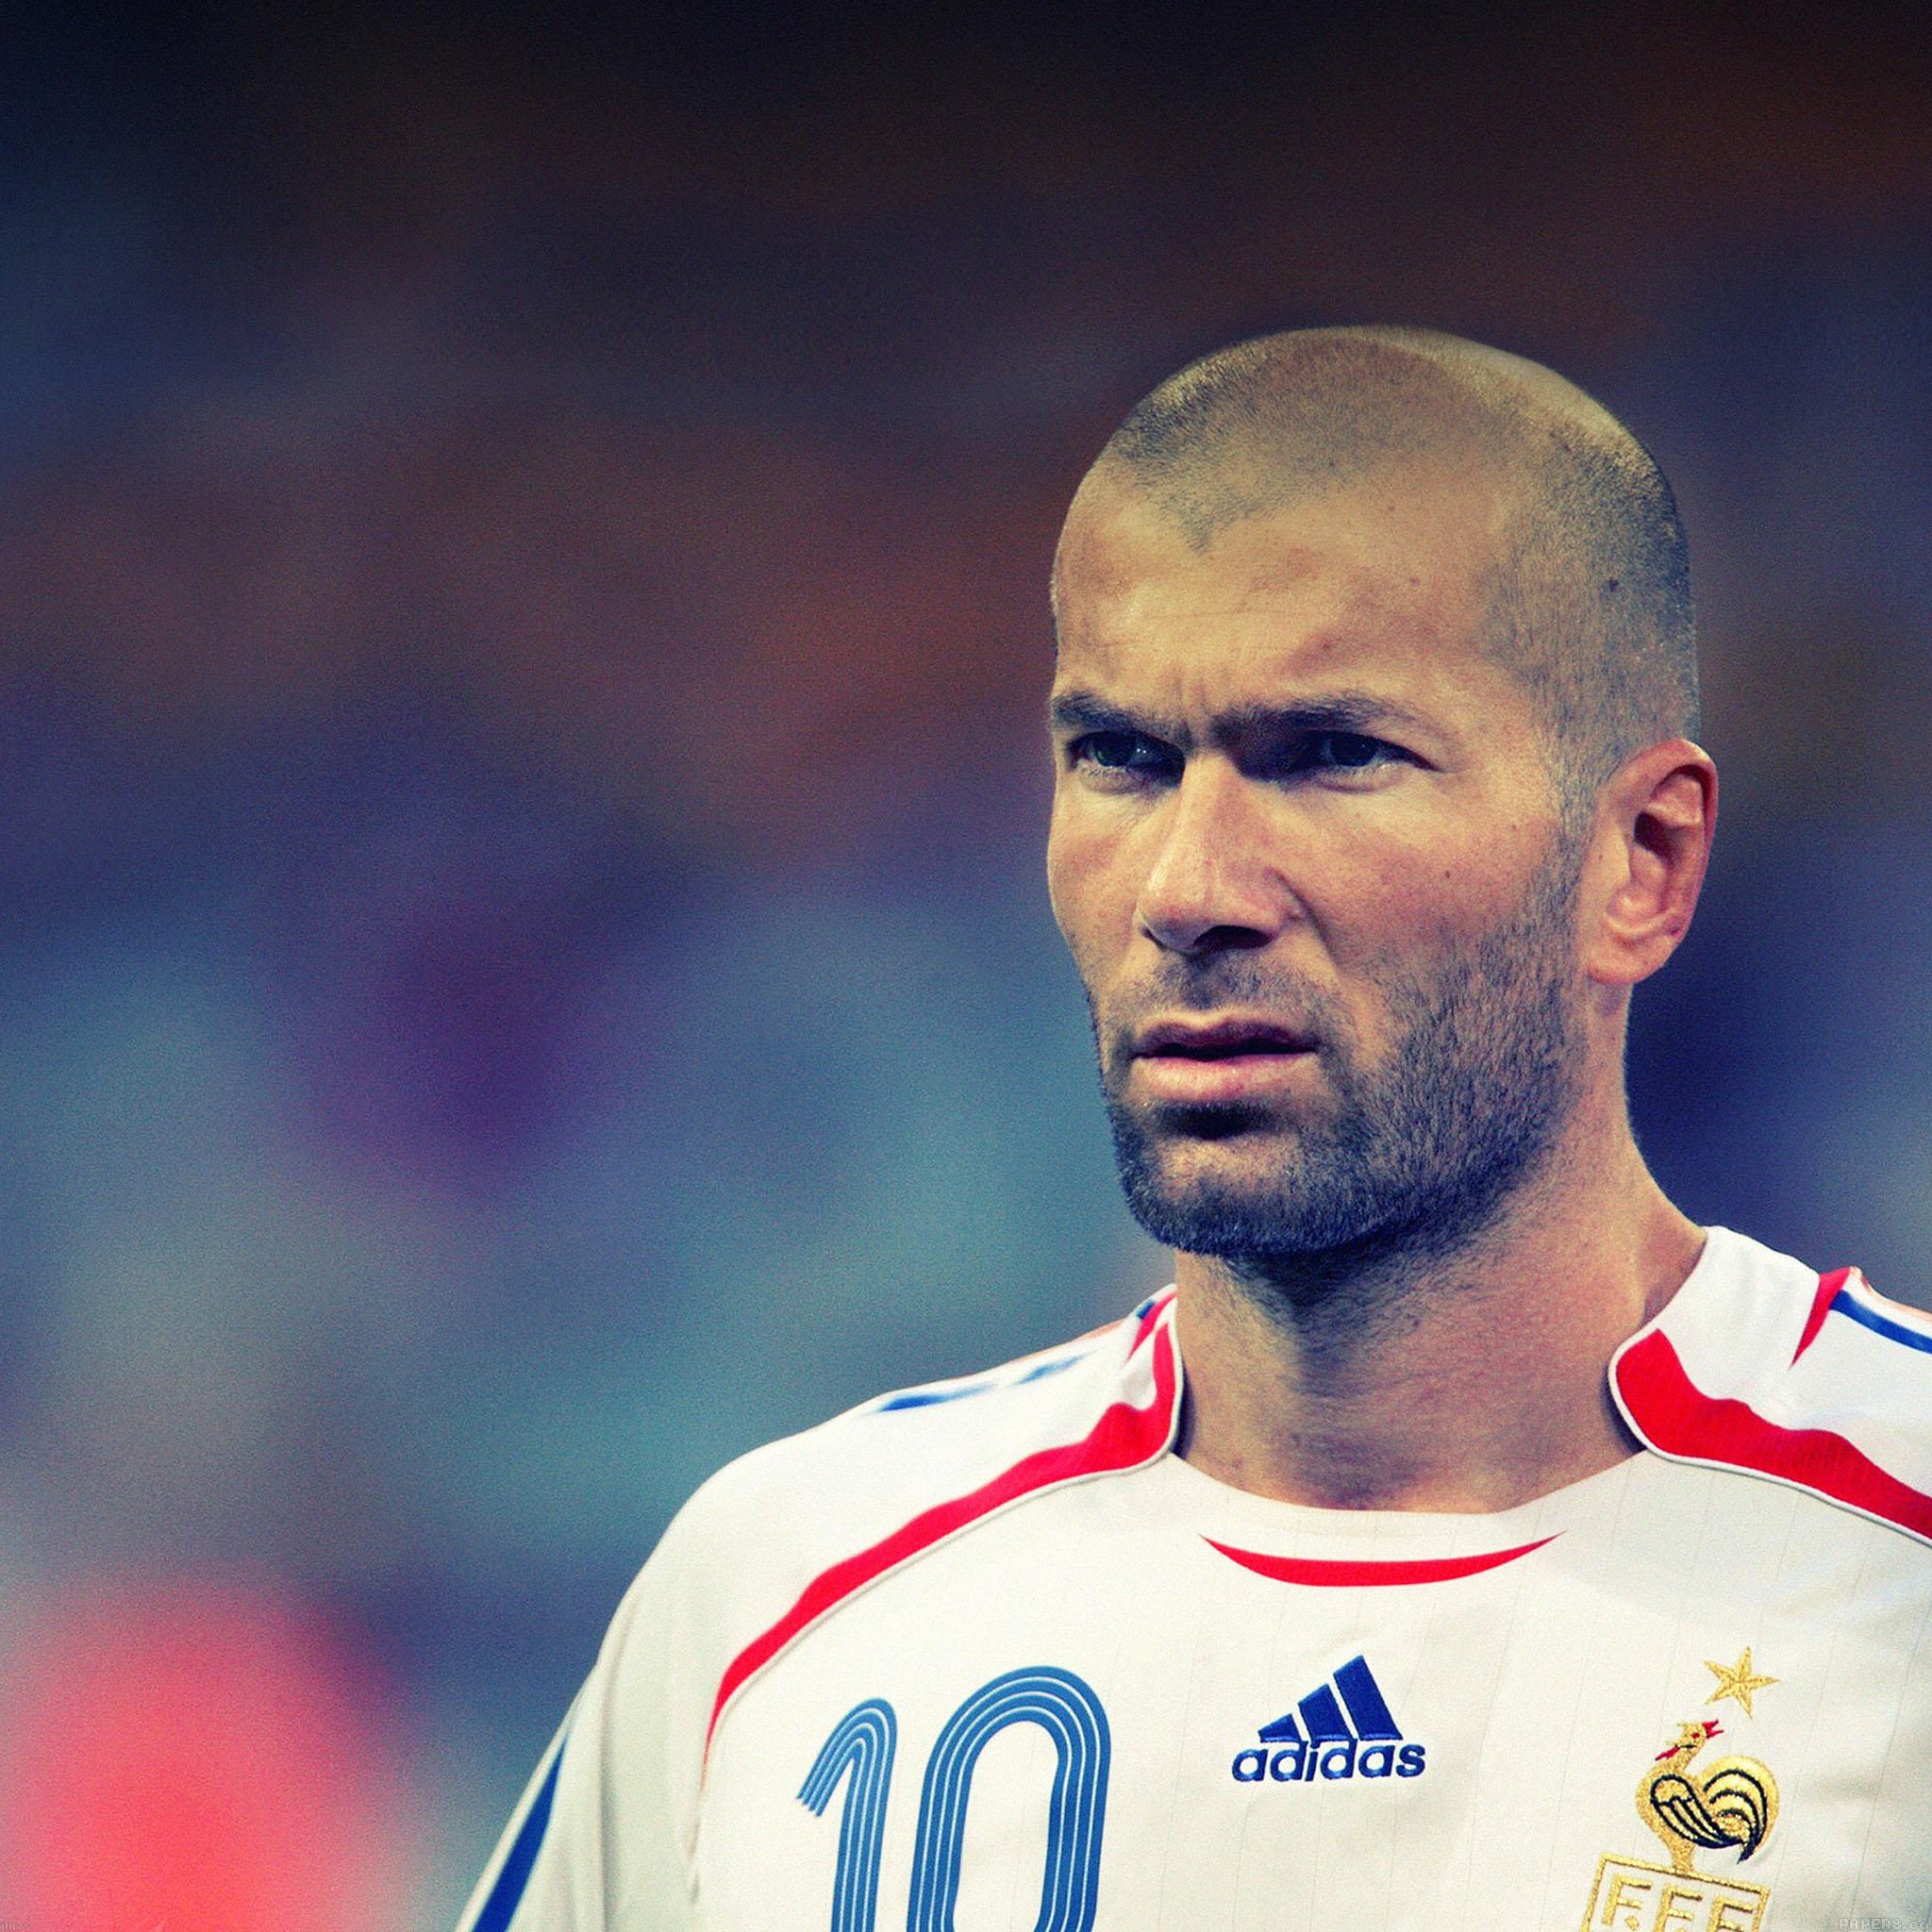 Ha75-wallpaper-zidane-soccer-star-sports